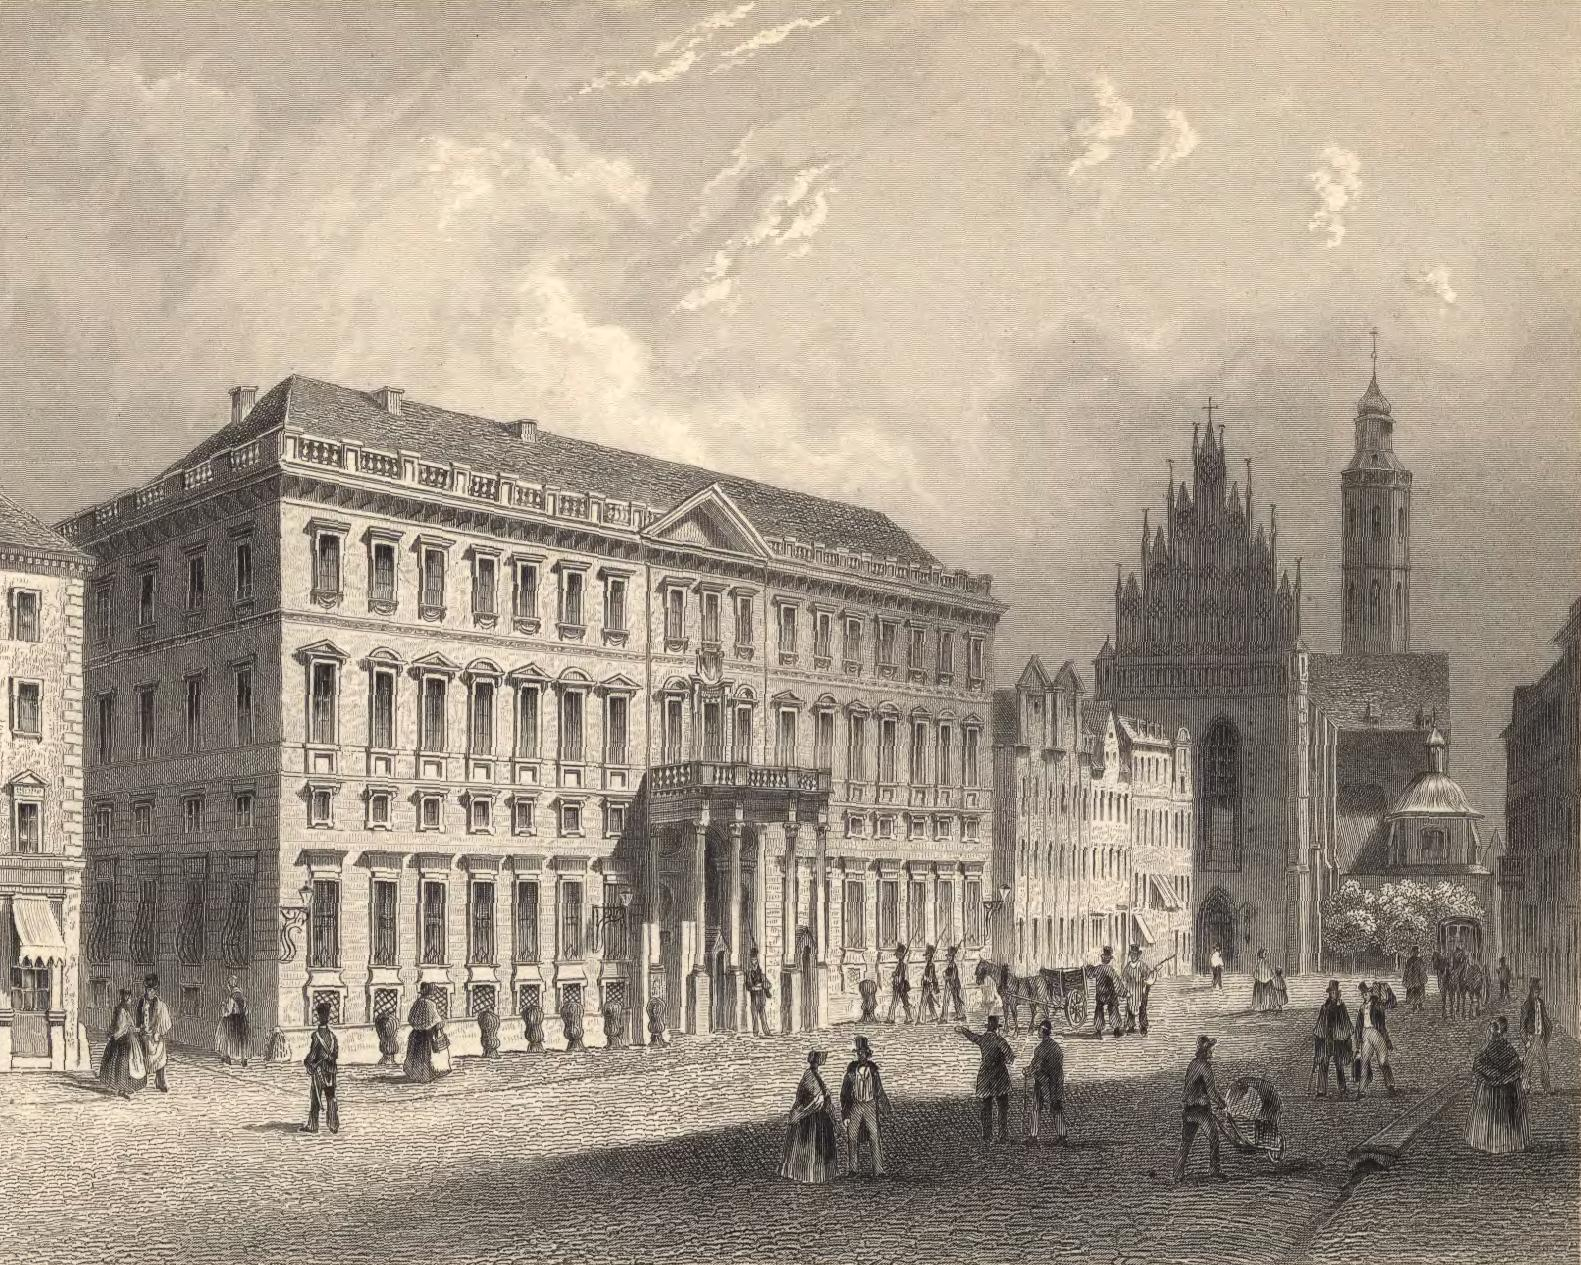 https://upload.wikimedia.org/wikipedia/commons/b/b2/Regierungsgeb%C3%A4ude_und_Dominikanerkirche_in_Breslau.jpg